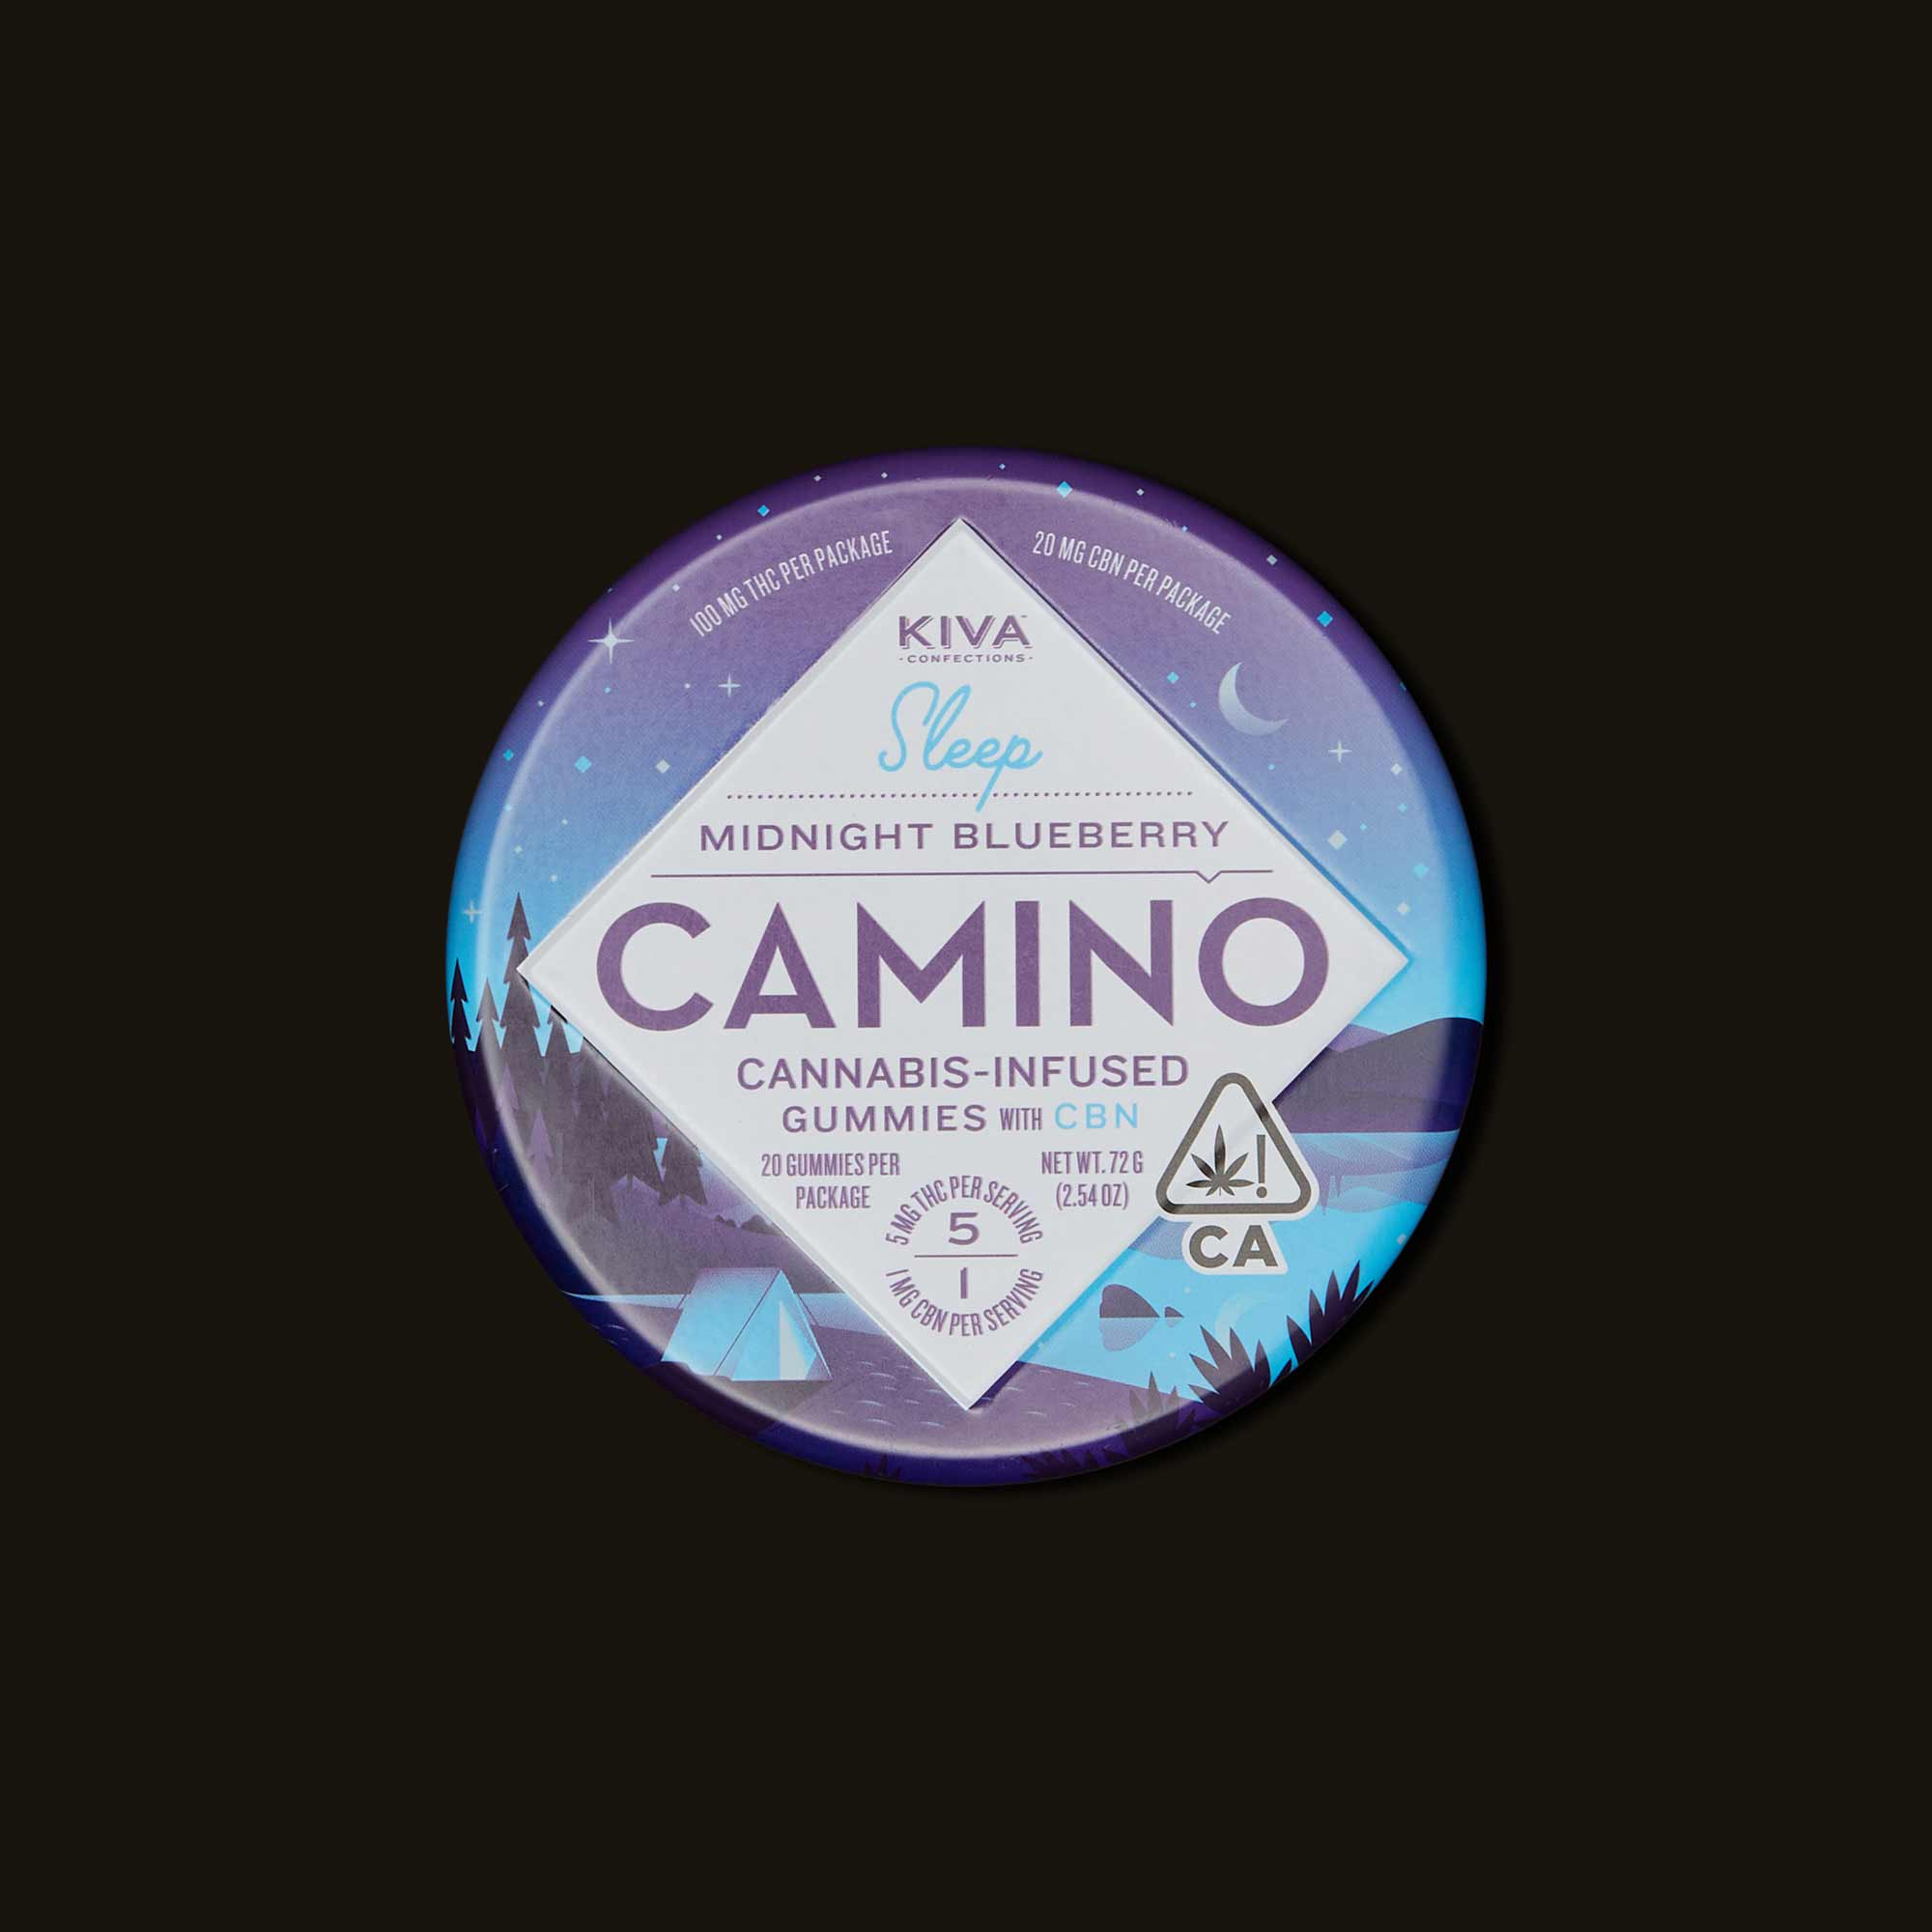 Camino Midnight Blueberry Gummies - 20 gummies (100mg THC)